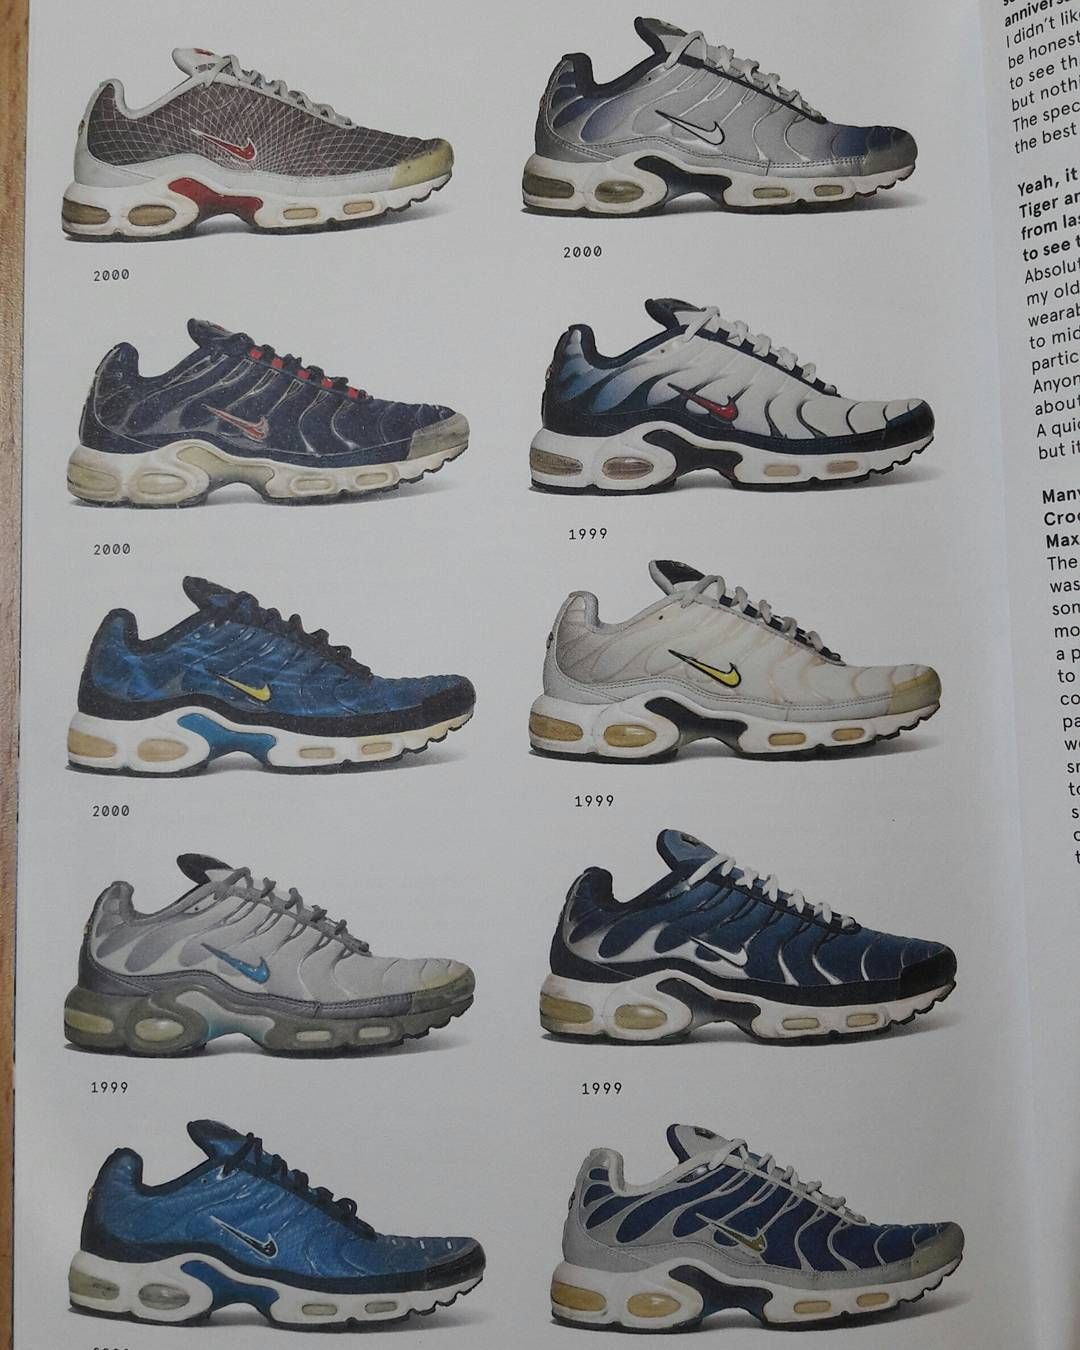 sale retailer 6e2dc 9cd67 TN Sko Sandaler, Pæne Sko, Sko Sneakers, Nike Air Max, Mænds Tøj